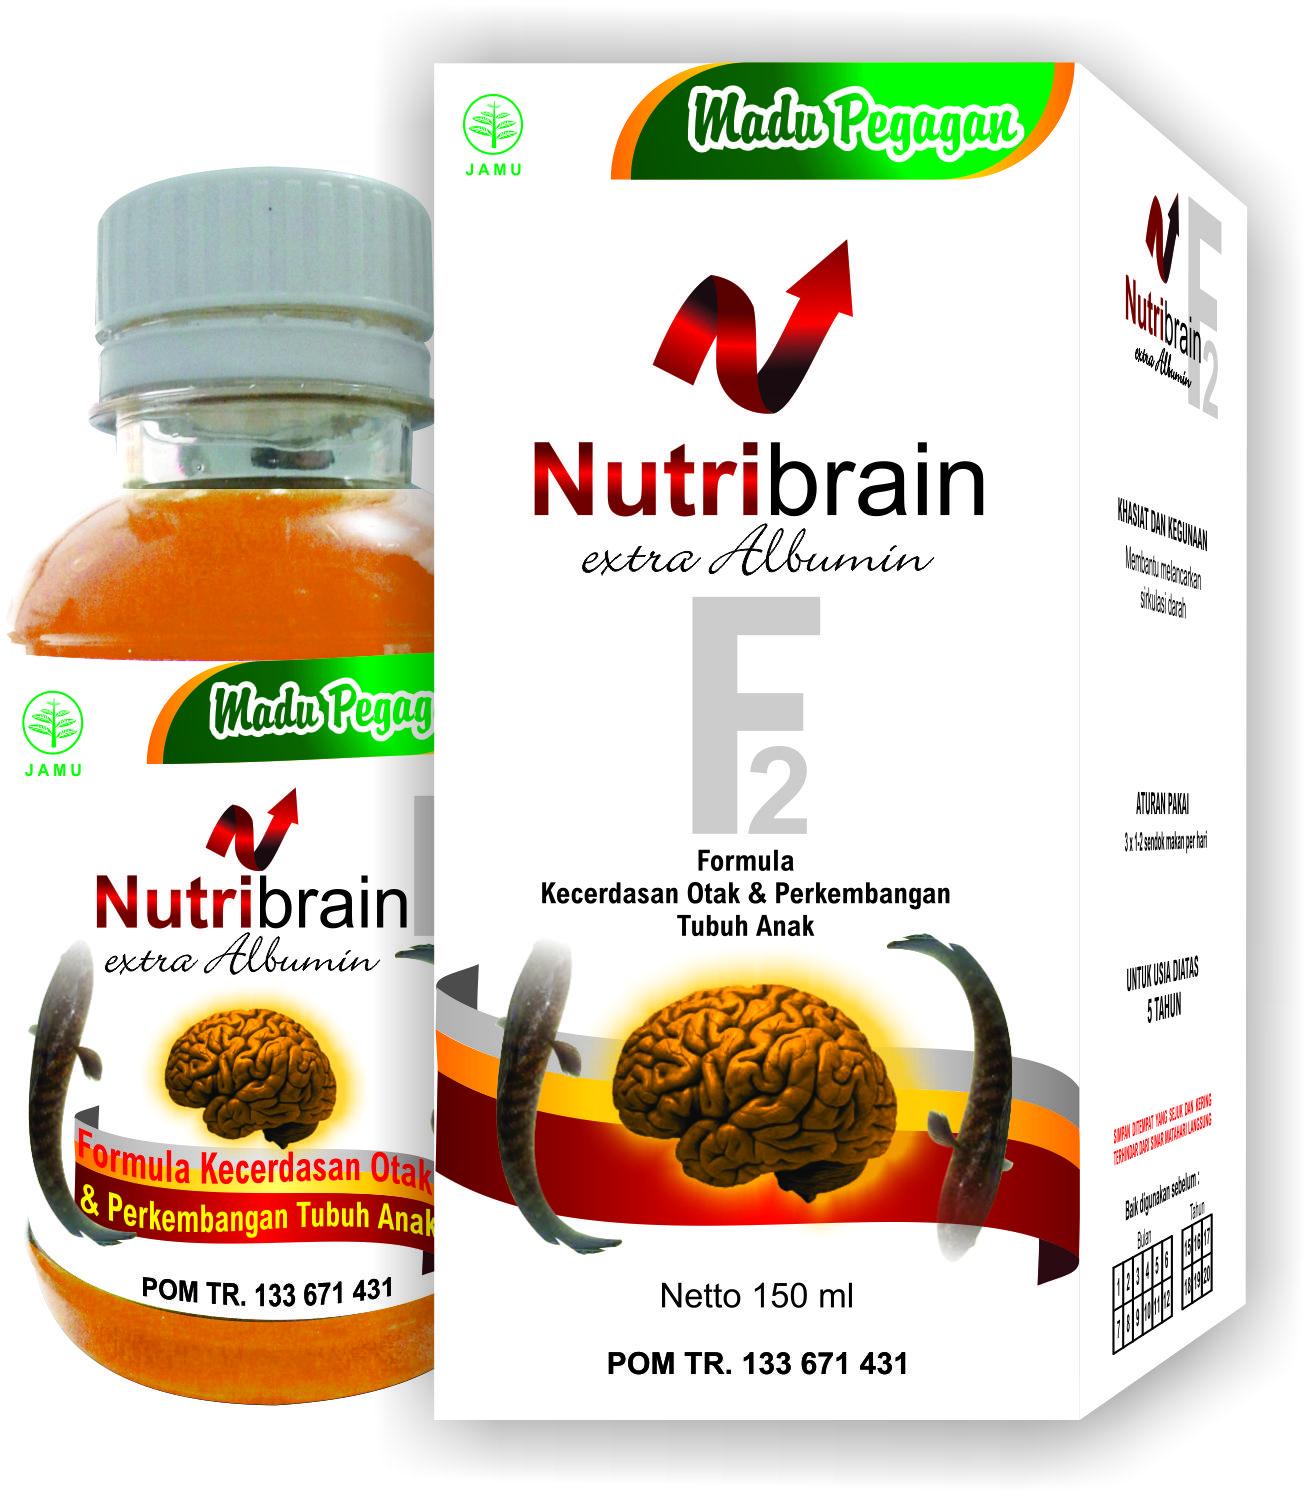 Nutribrain